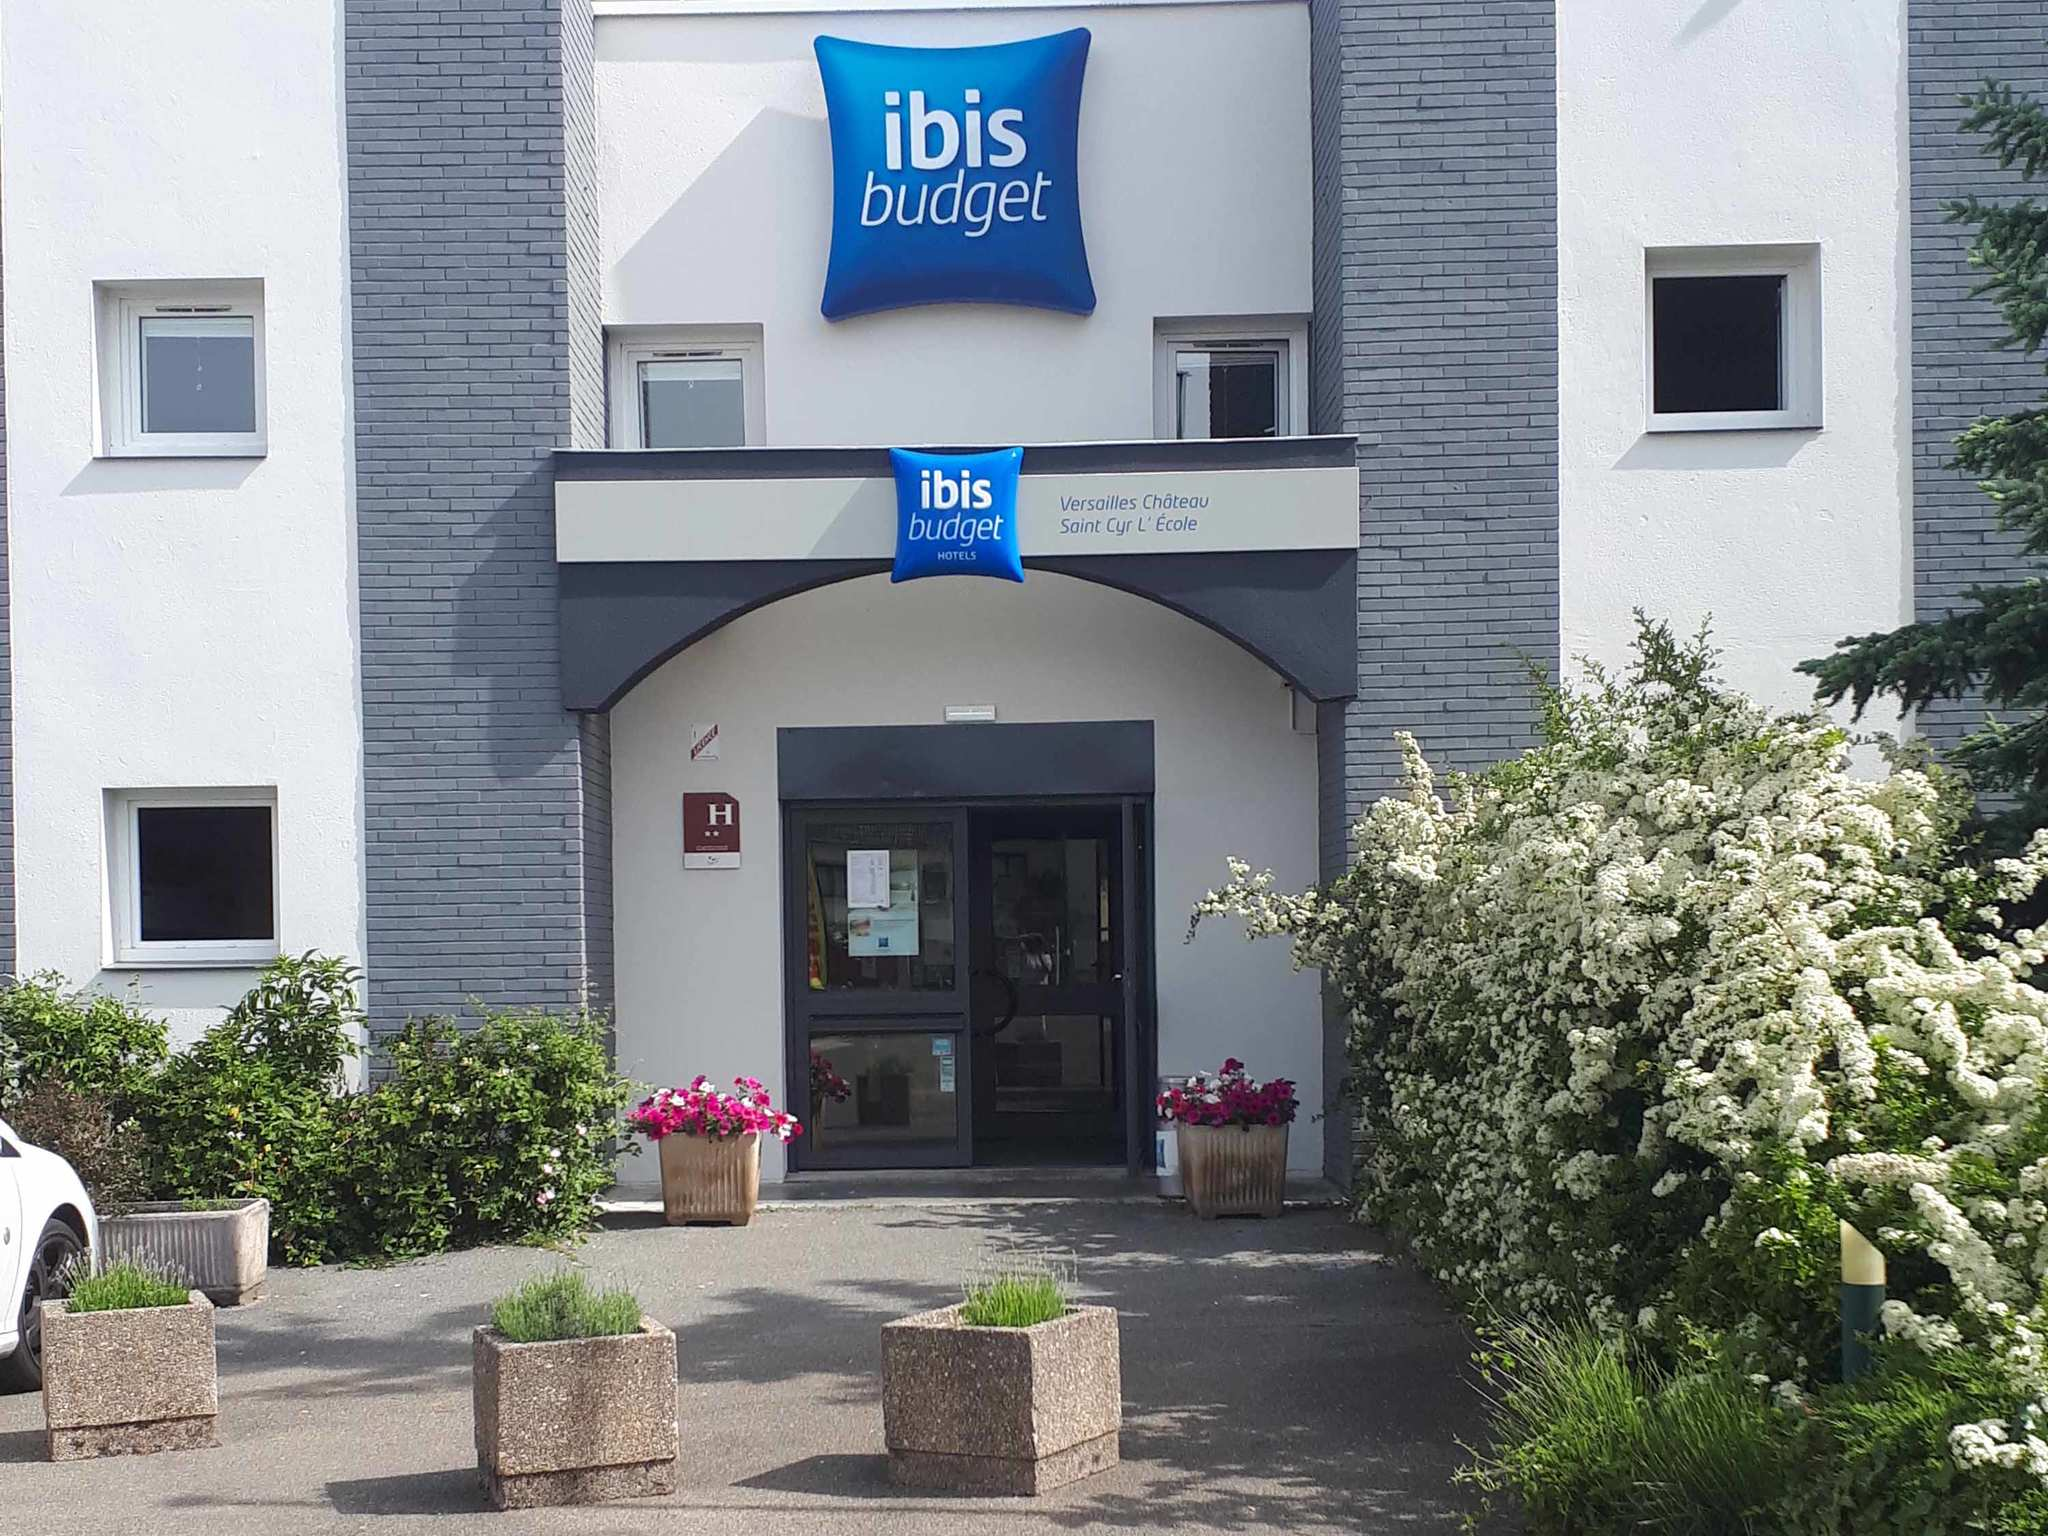 Hôtel - ibis budget Versailles Château Saint-Cyr